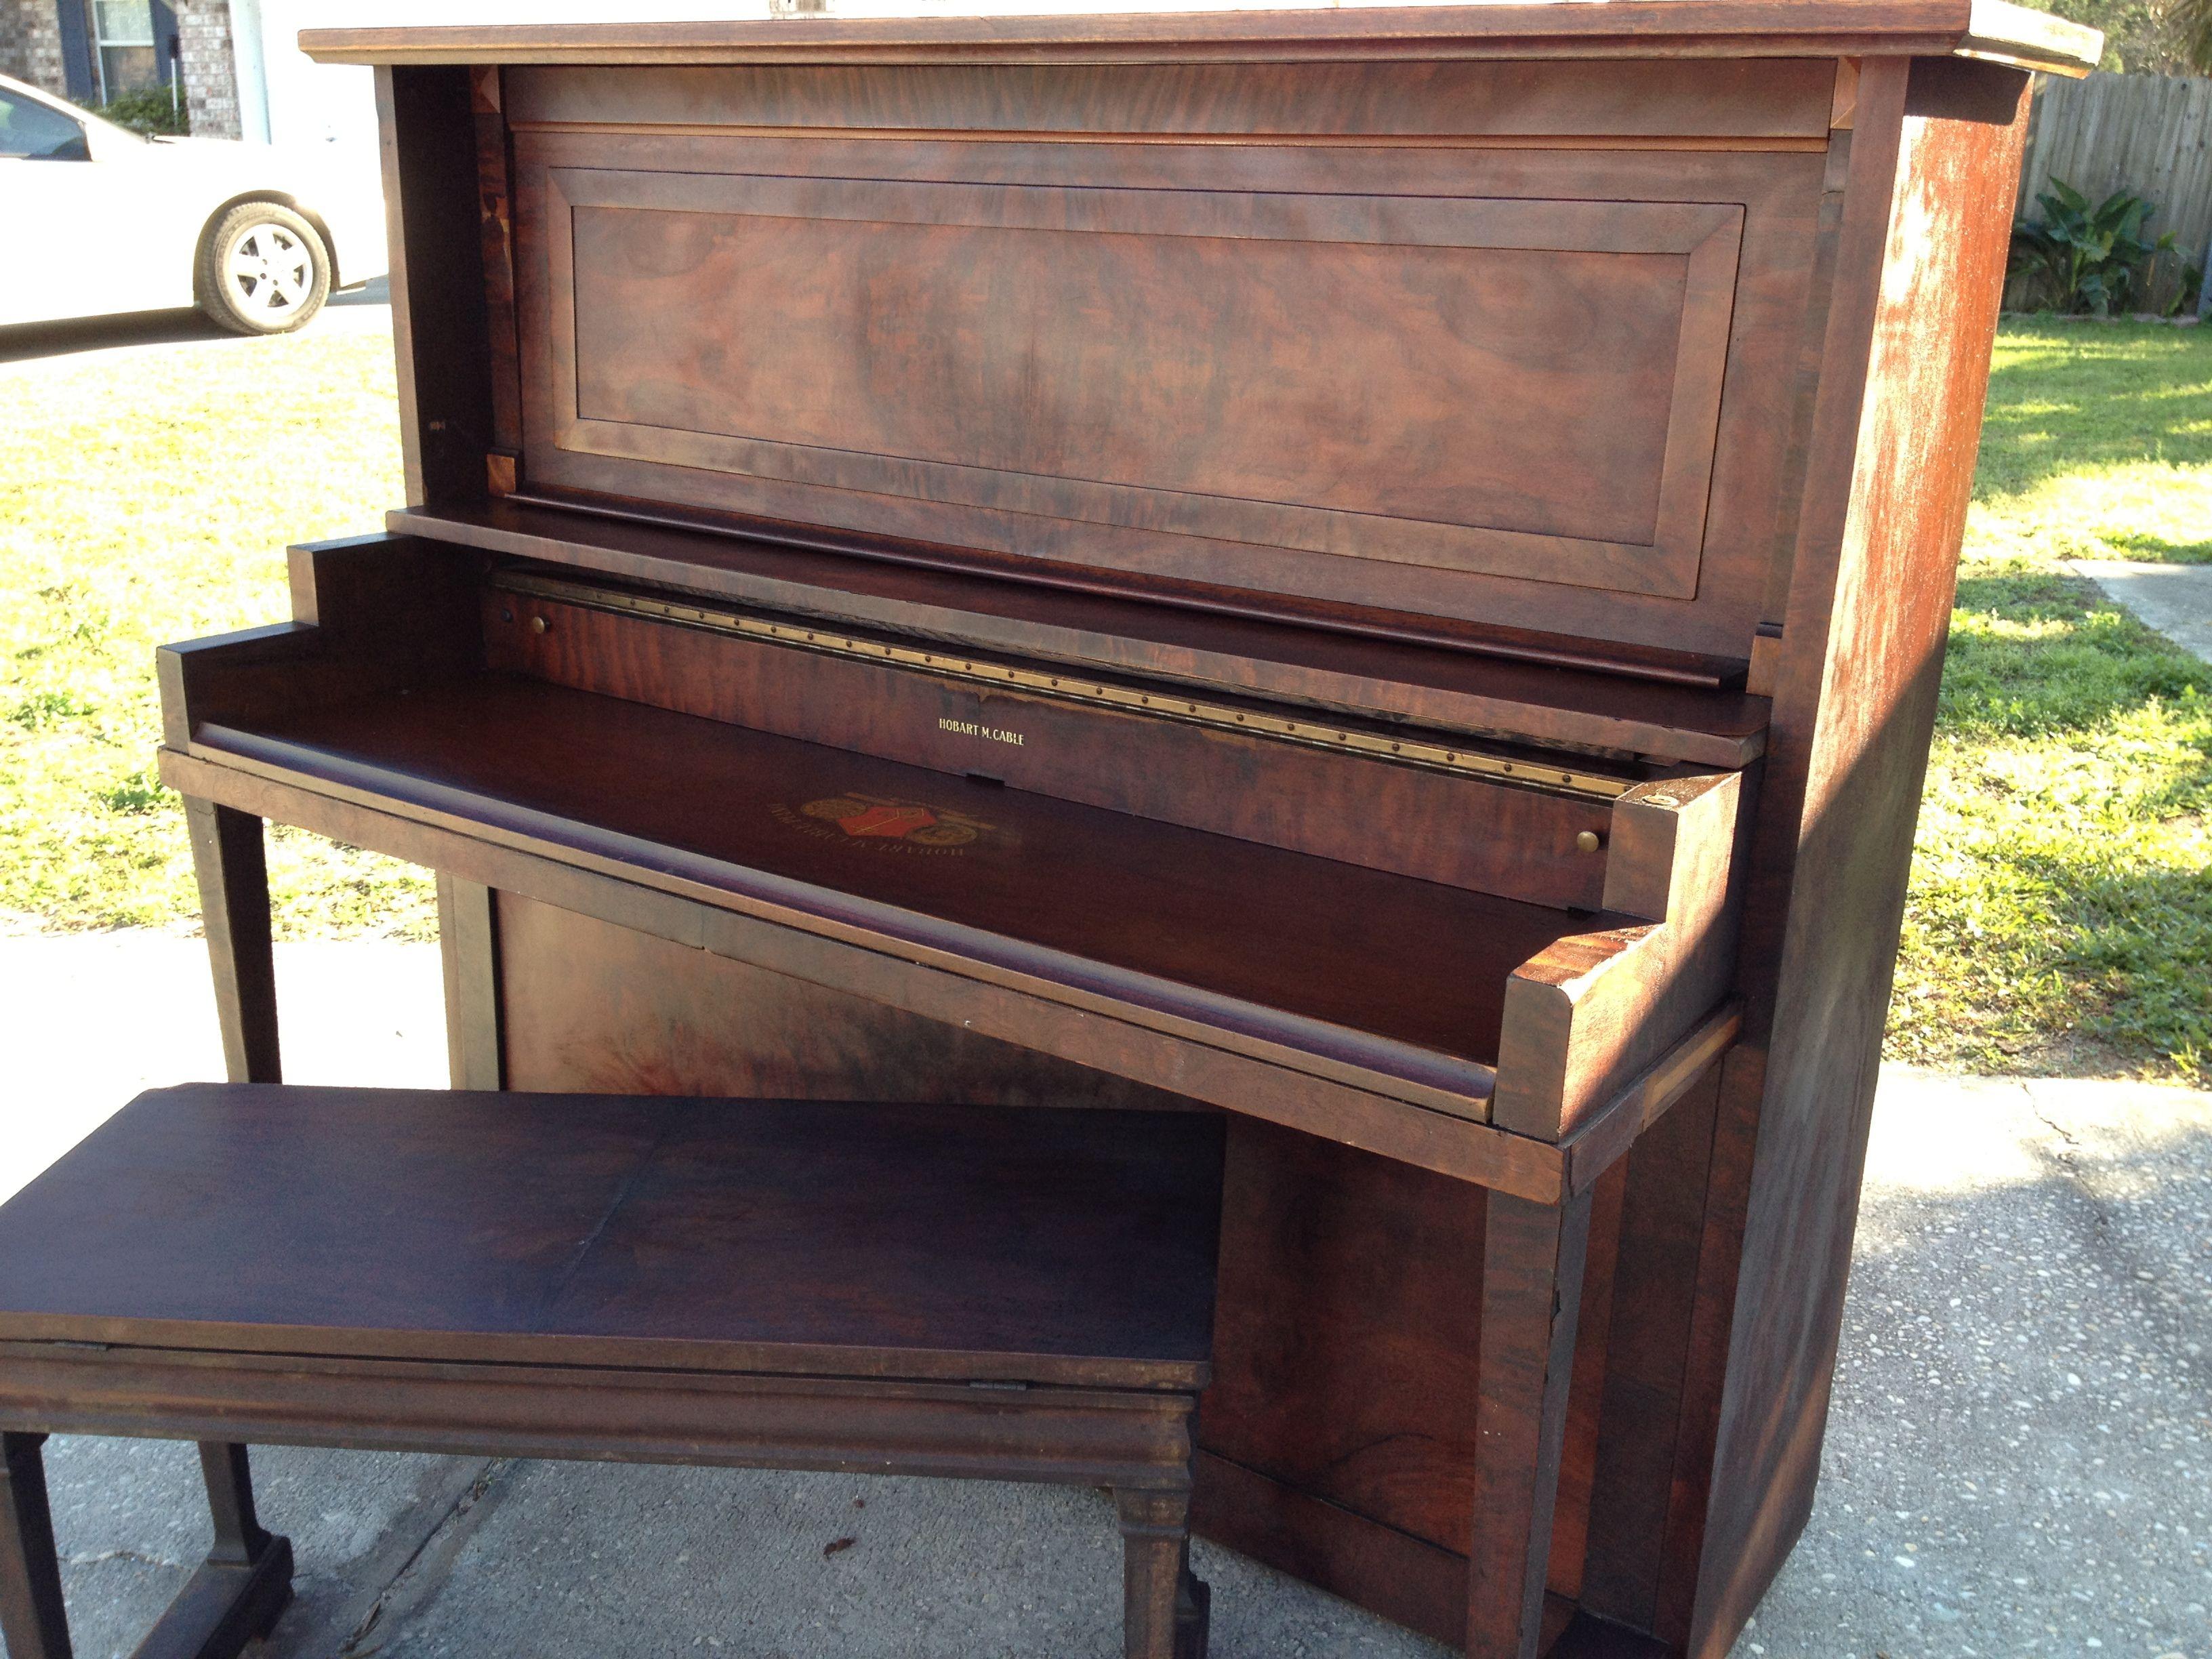 1909 Hobart M Cable Upright Grand Piano Re Purposes Into A Desk Amazing Piano Upright Grand Piano Piano Desk